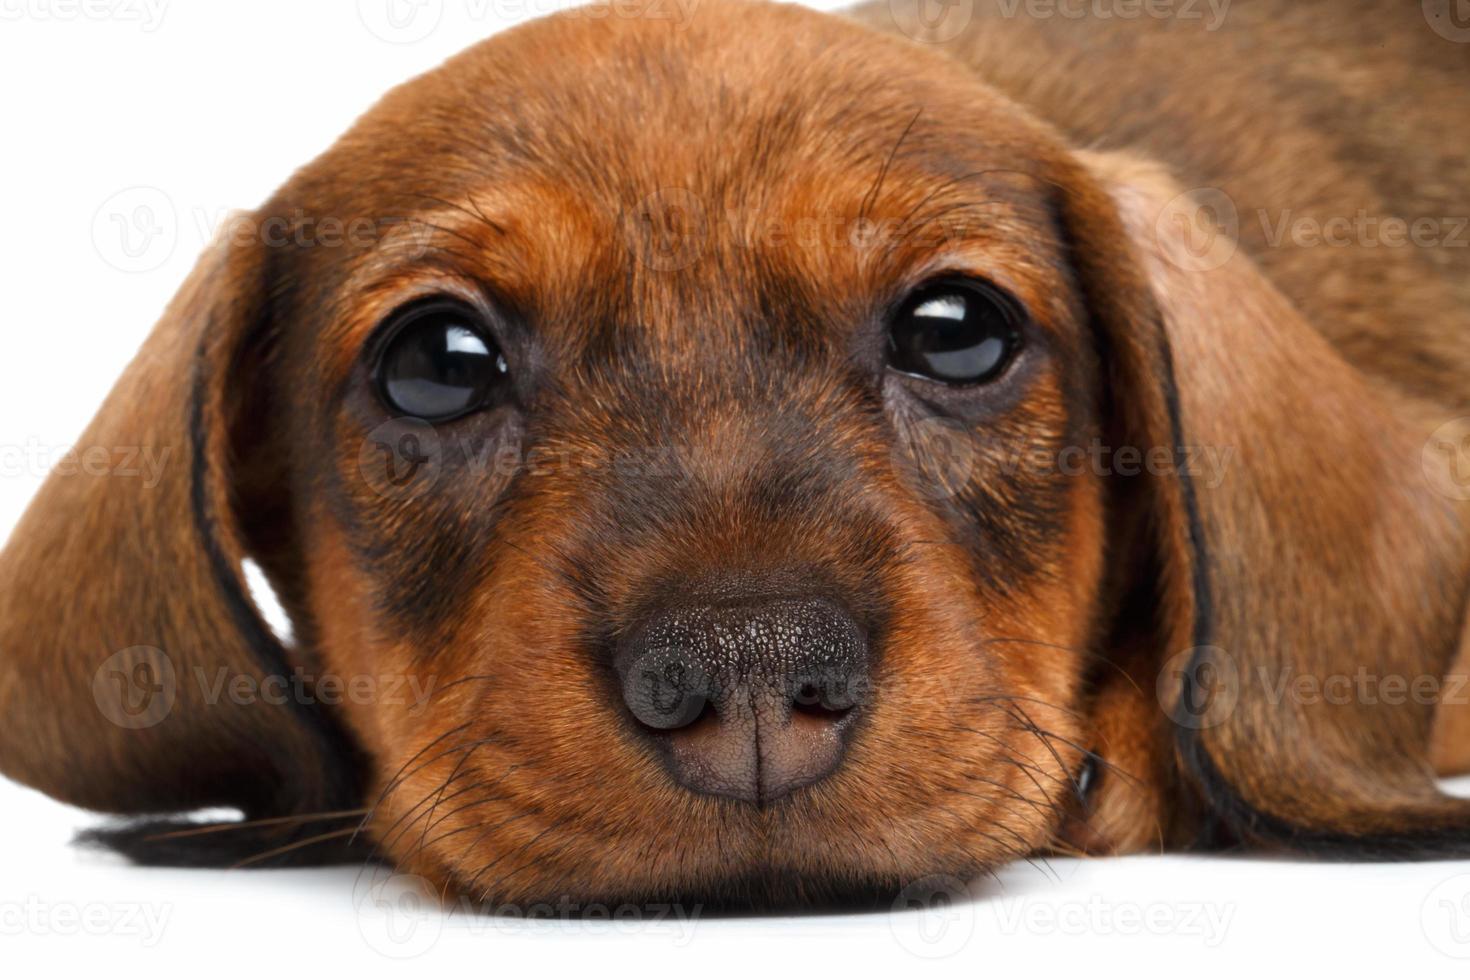 close-up Dachshund puppy photo